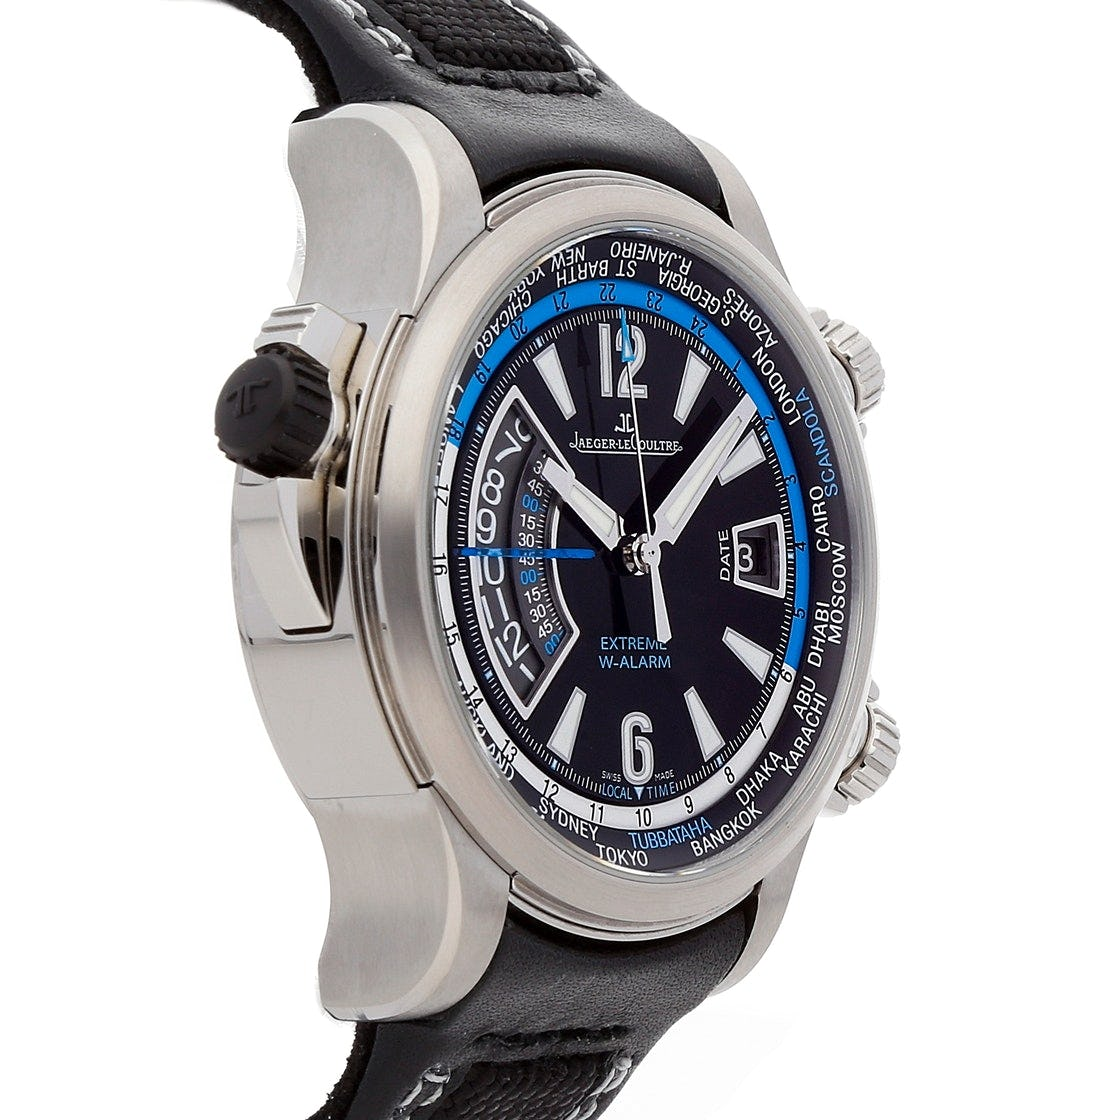 Jaeger-LeCoultre Master Compressor Extreme World Alarm Tides of Time: Big Name, Big Watch